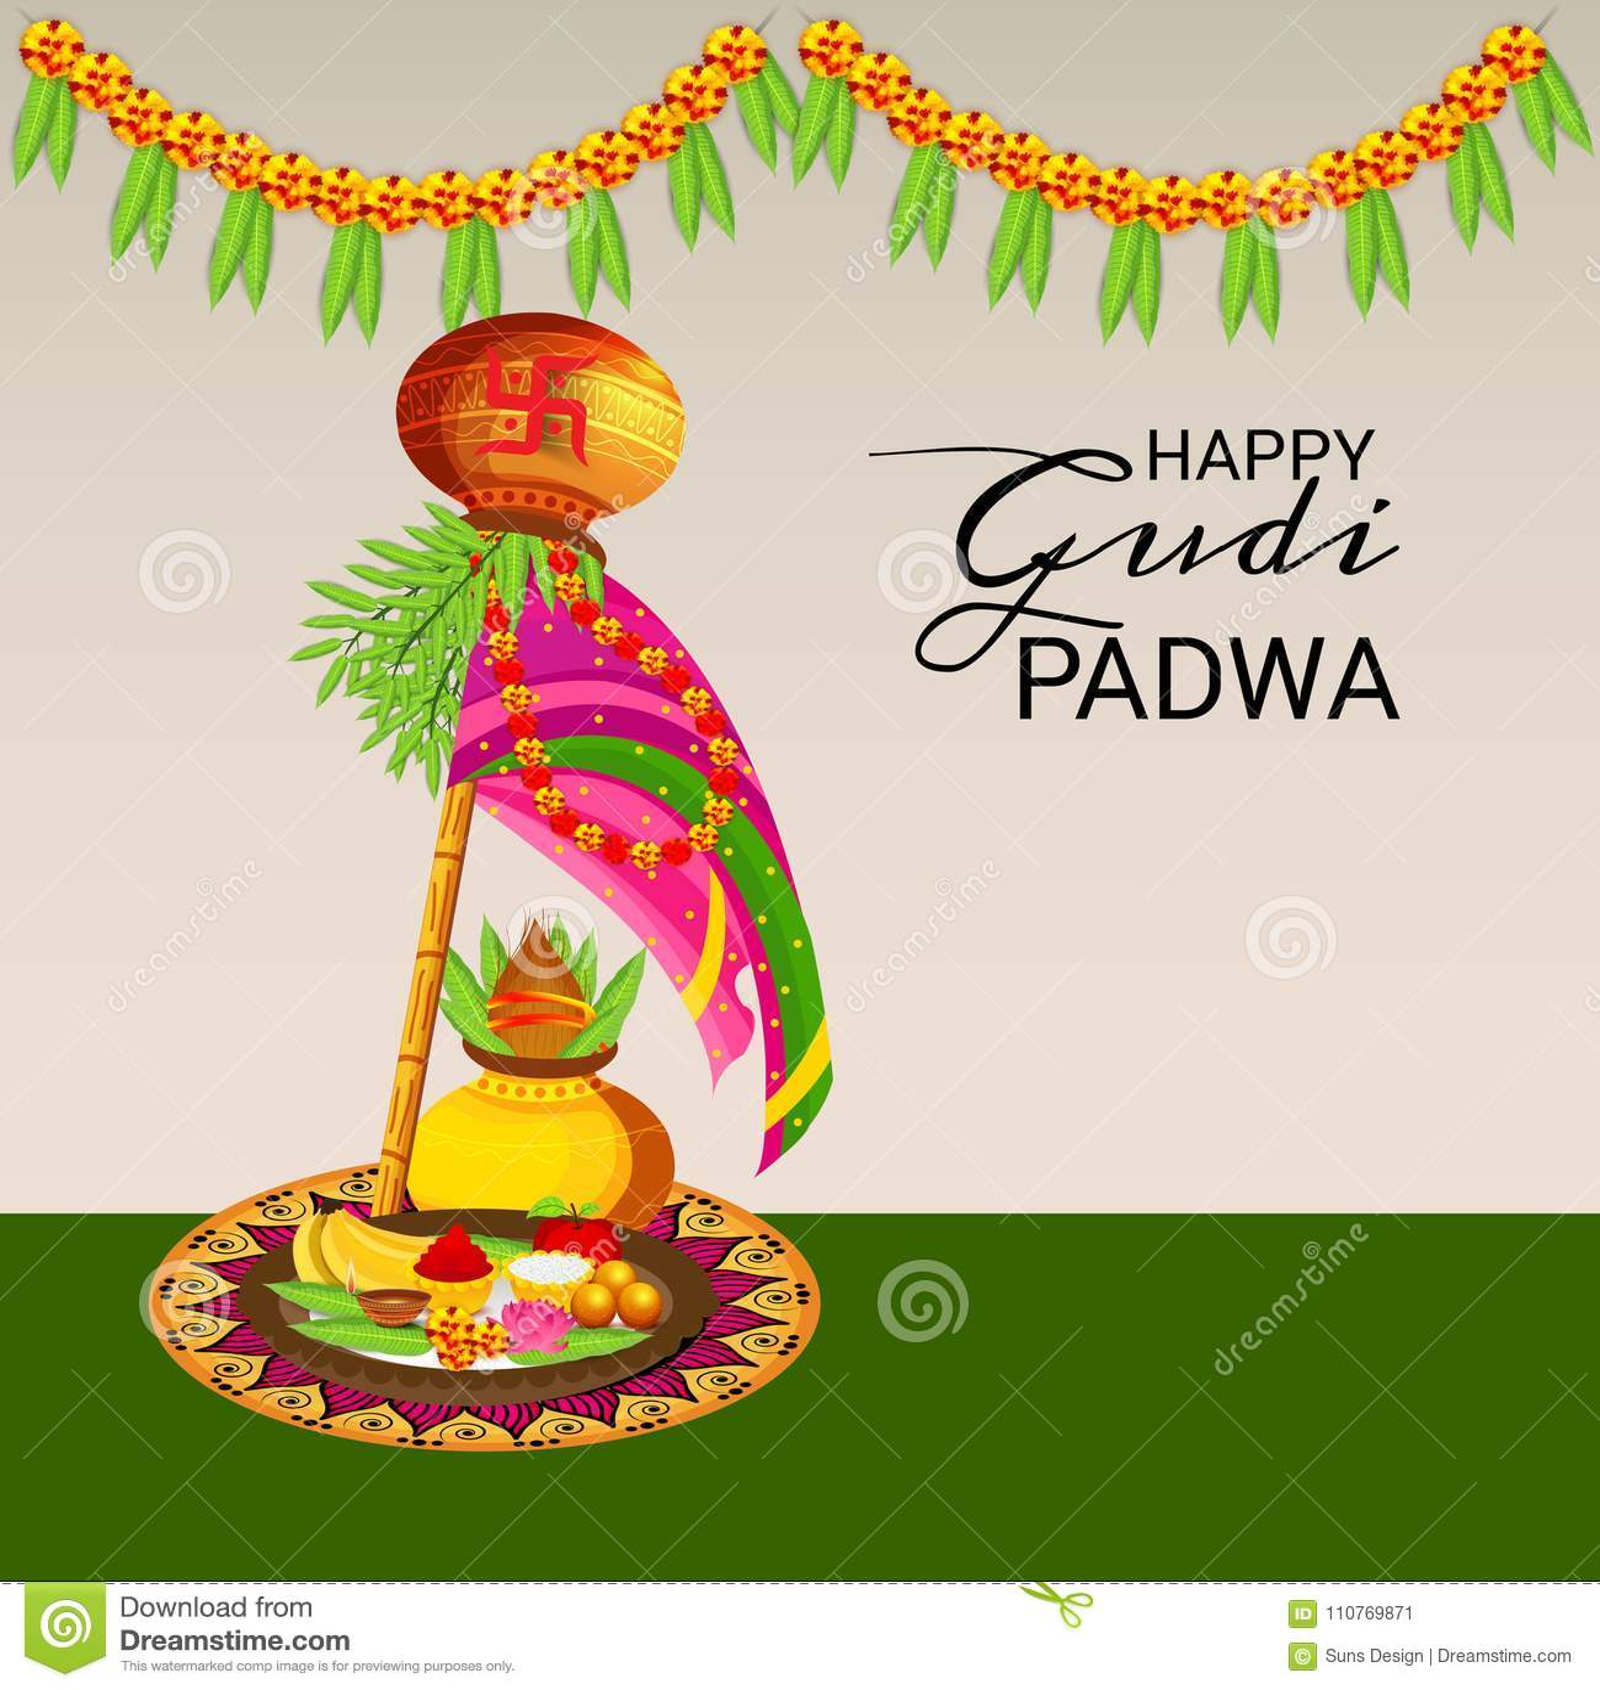 Happy gudi padwa marathi new year stock illustration illustration happy gudi padwa marathi new year bamboo card kristyandbryce Gallery